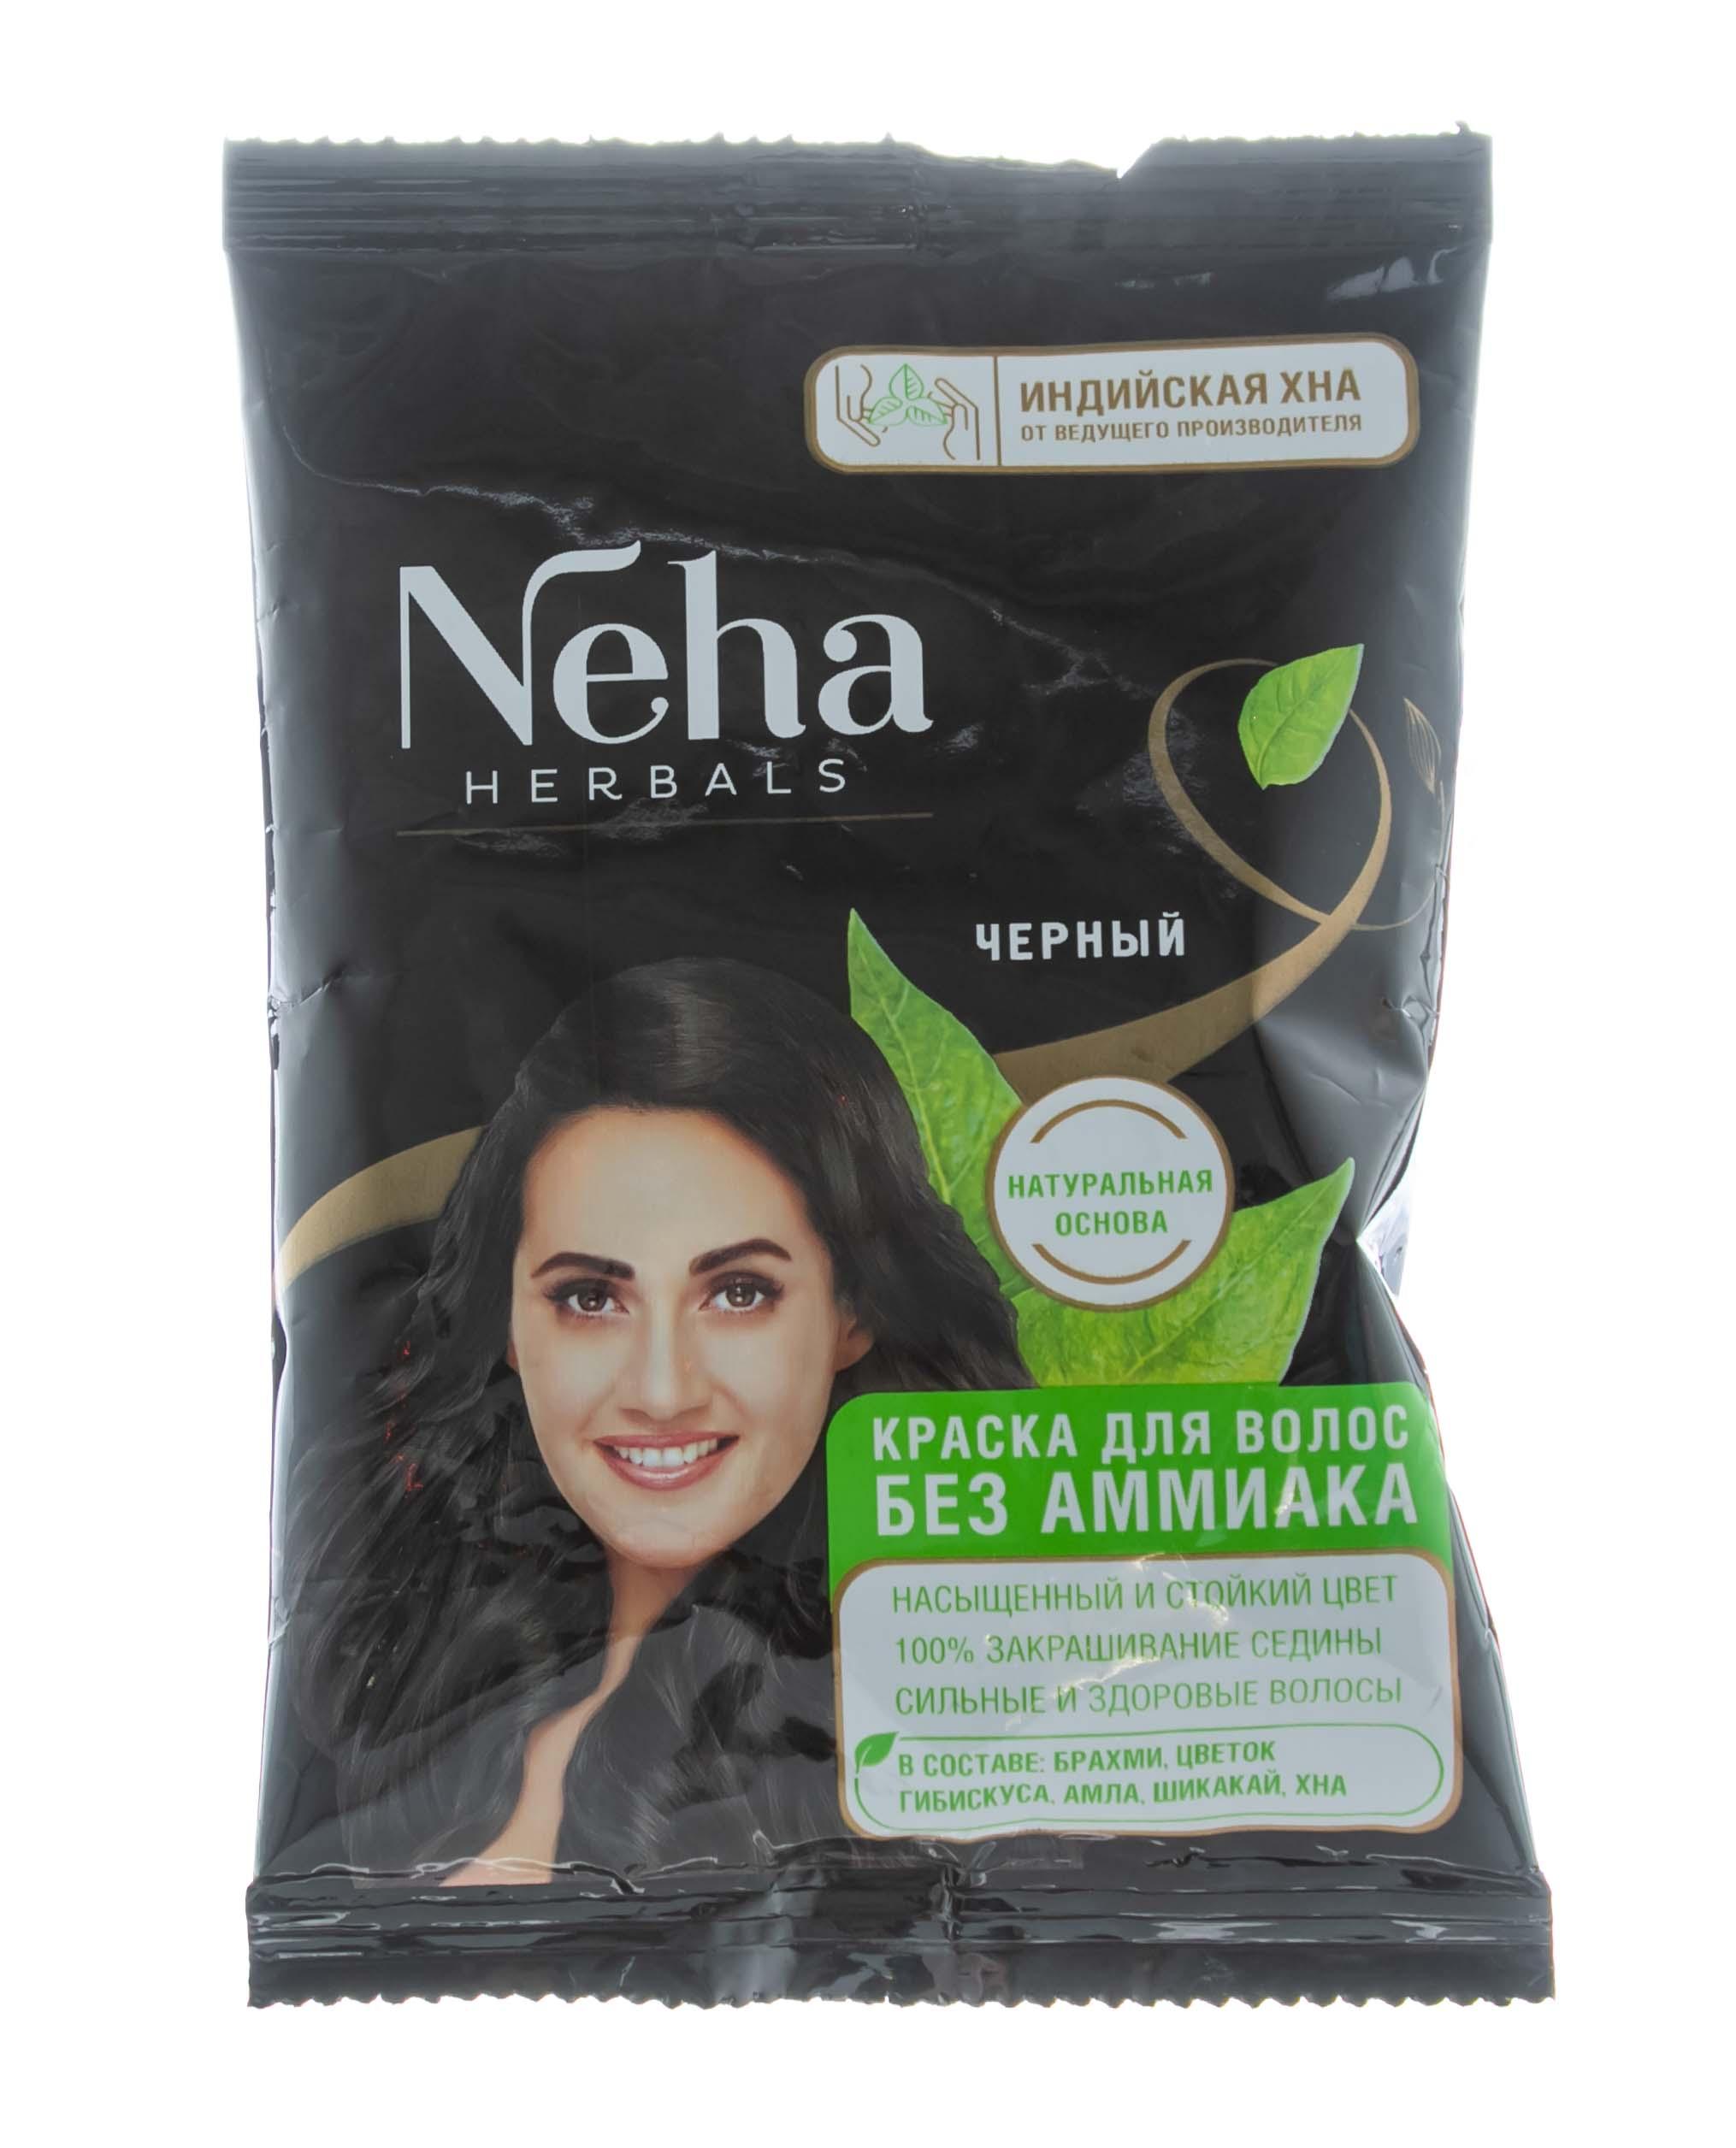 Купить Himalaya Herbals Краска для волос без аммиака Neha Herbals, 20 г - Черный (Himalaya Herbals, Окрашивание)